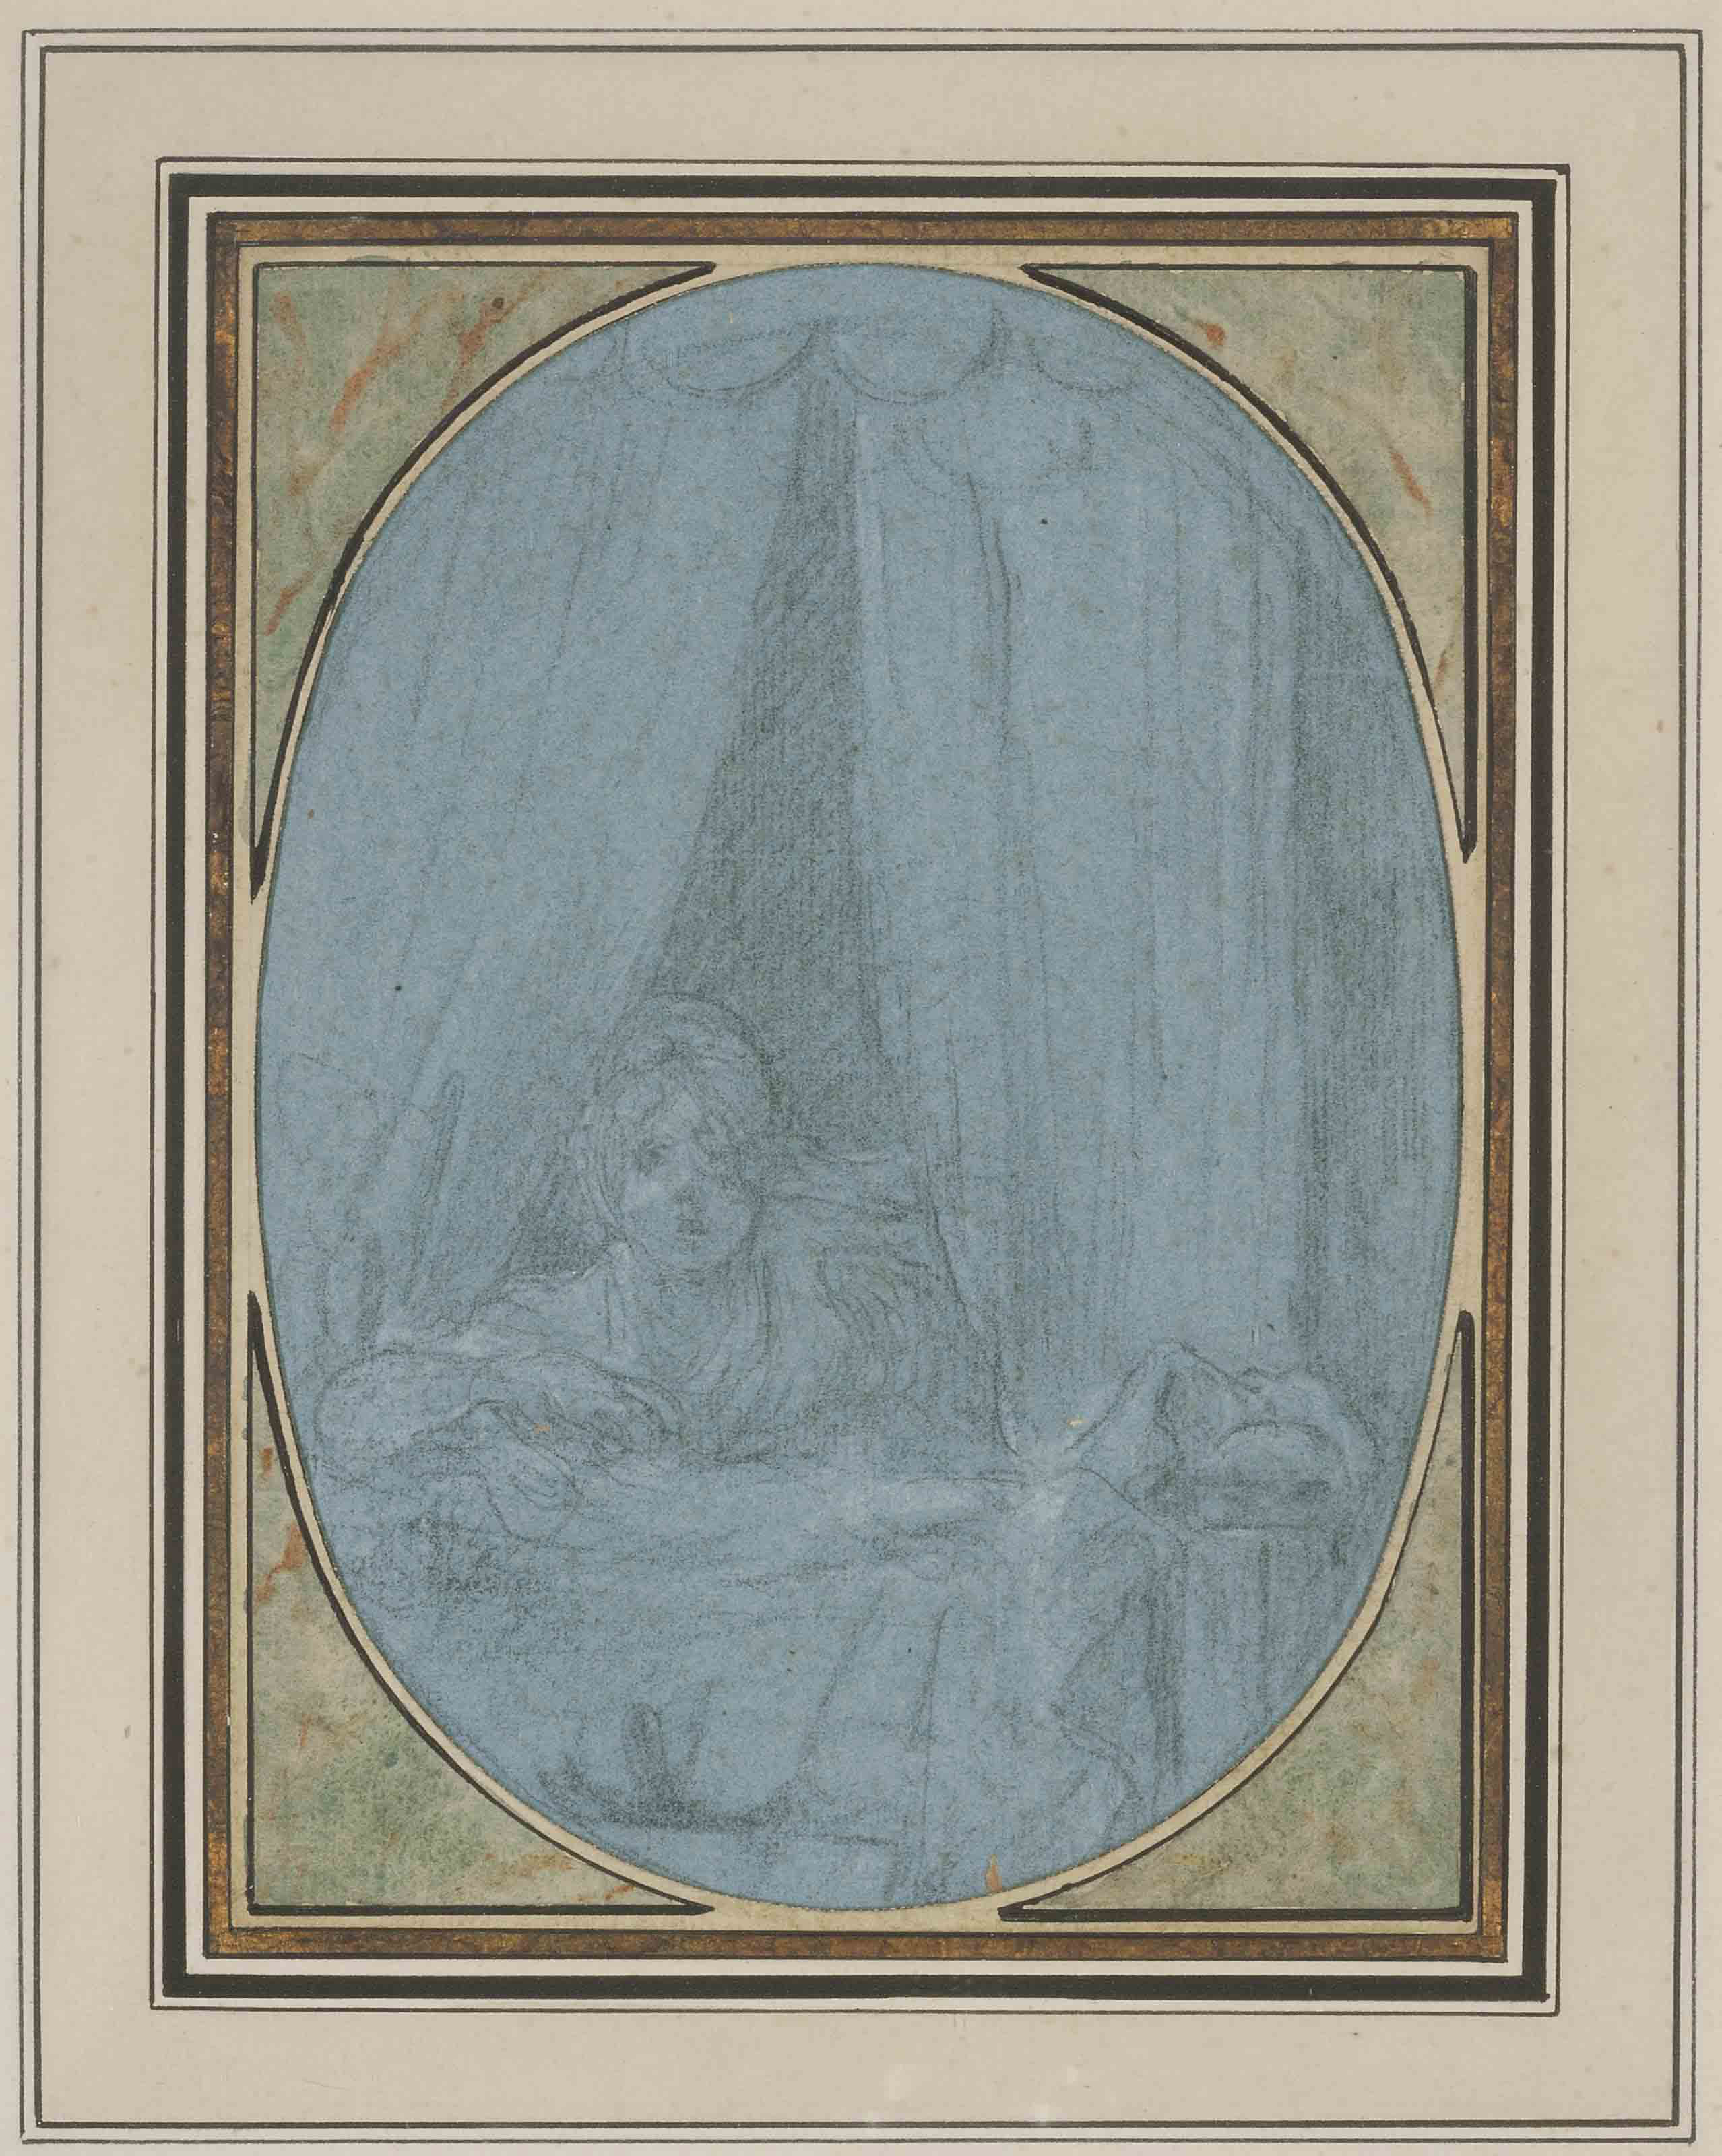 Noel Hallé (French, 1711-1781)